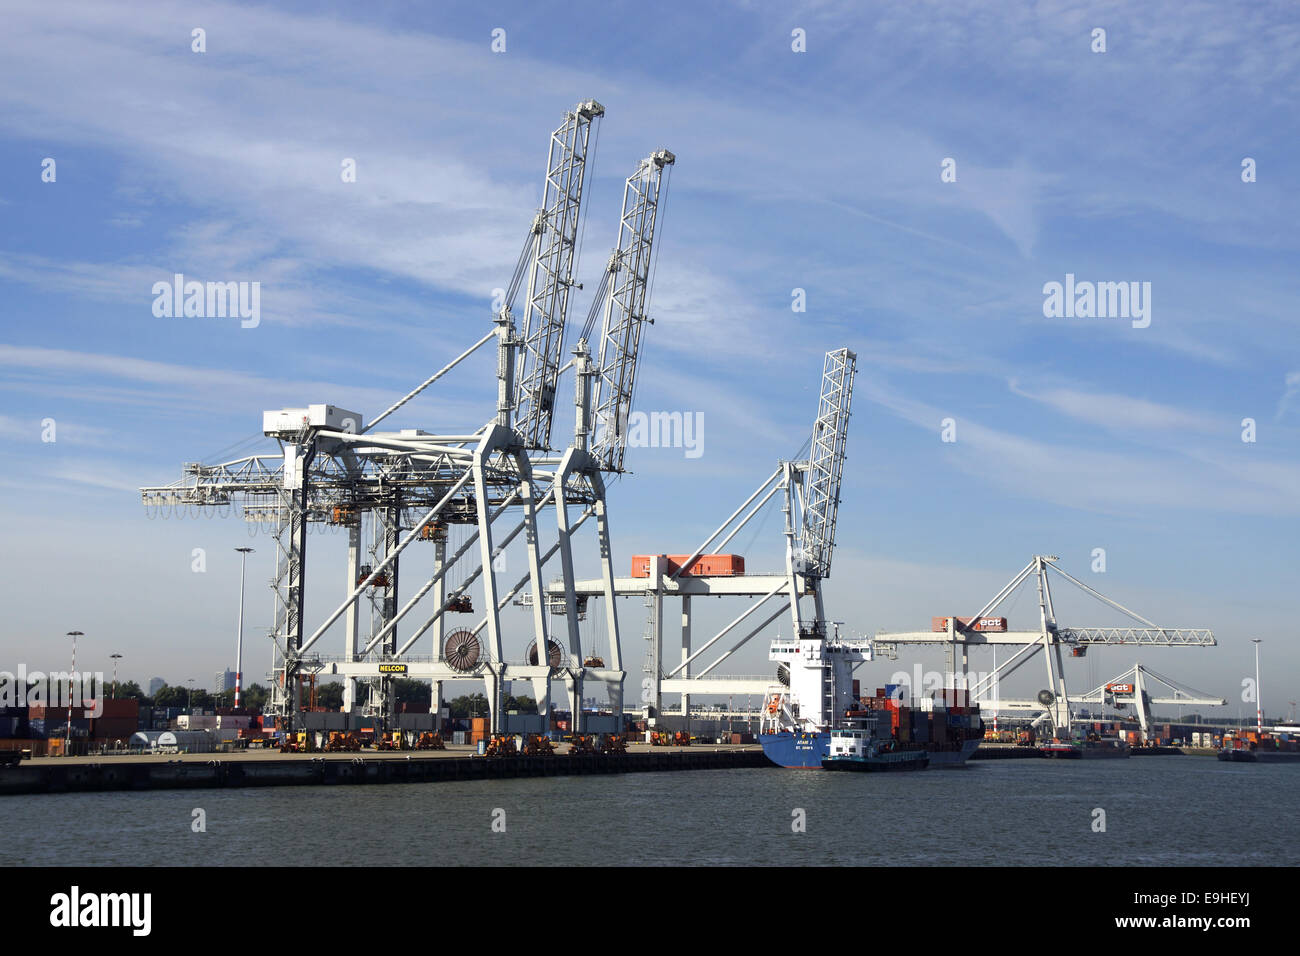 Container bridge in the harbor of Rotterdam Stock Photo